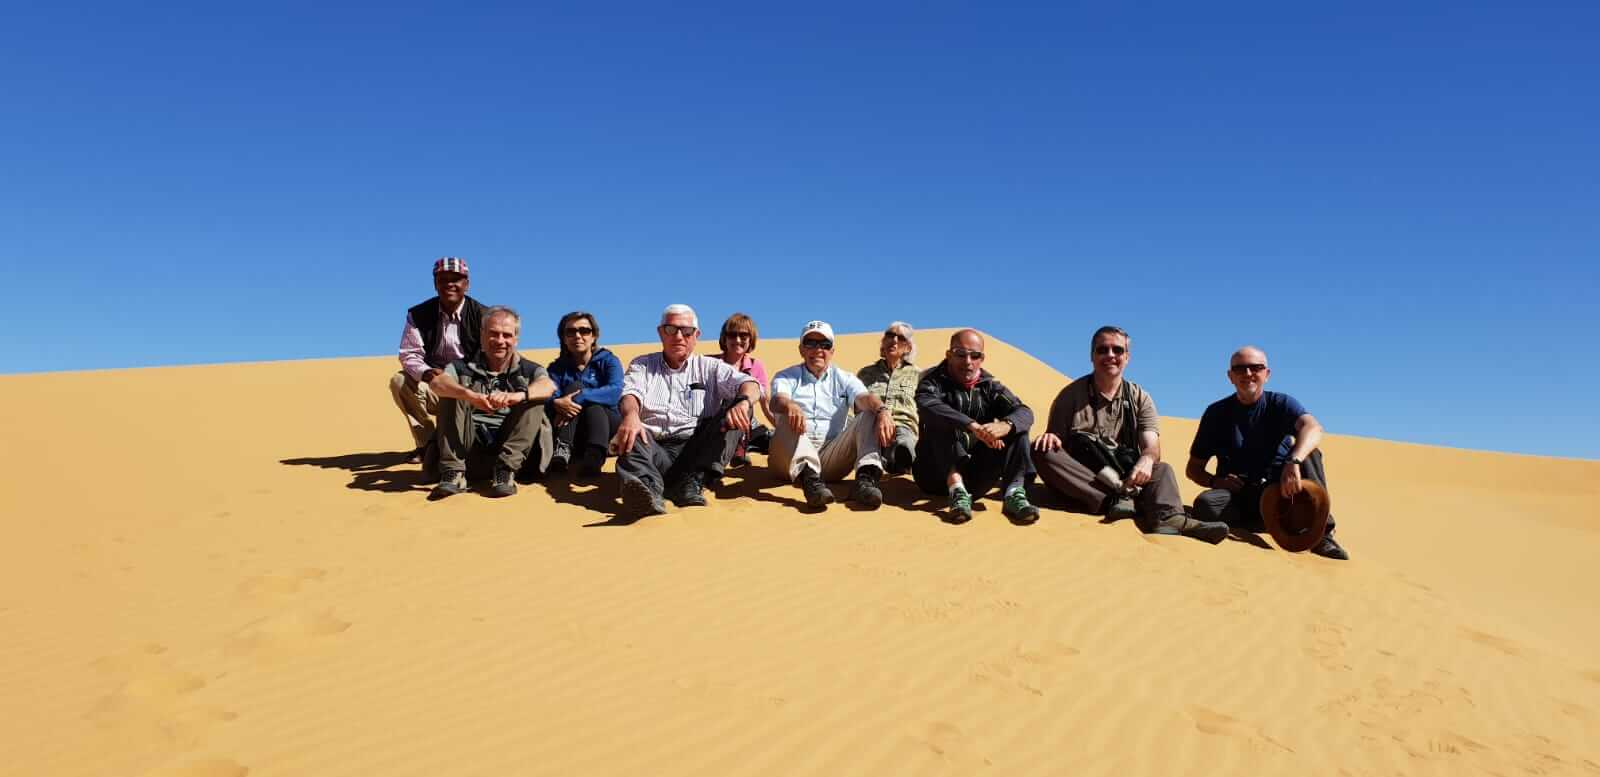 viajes en grupo a Sudán